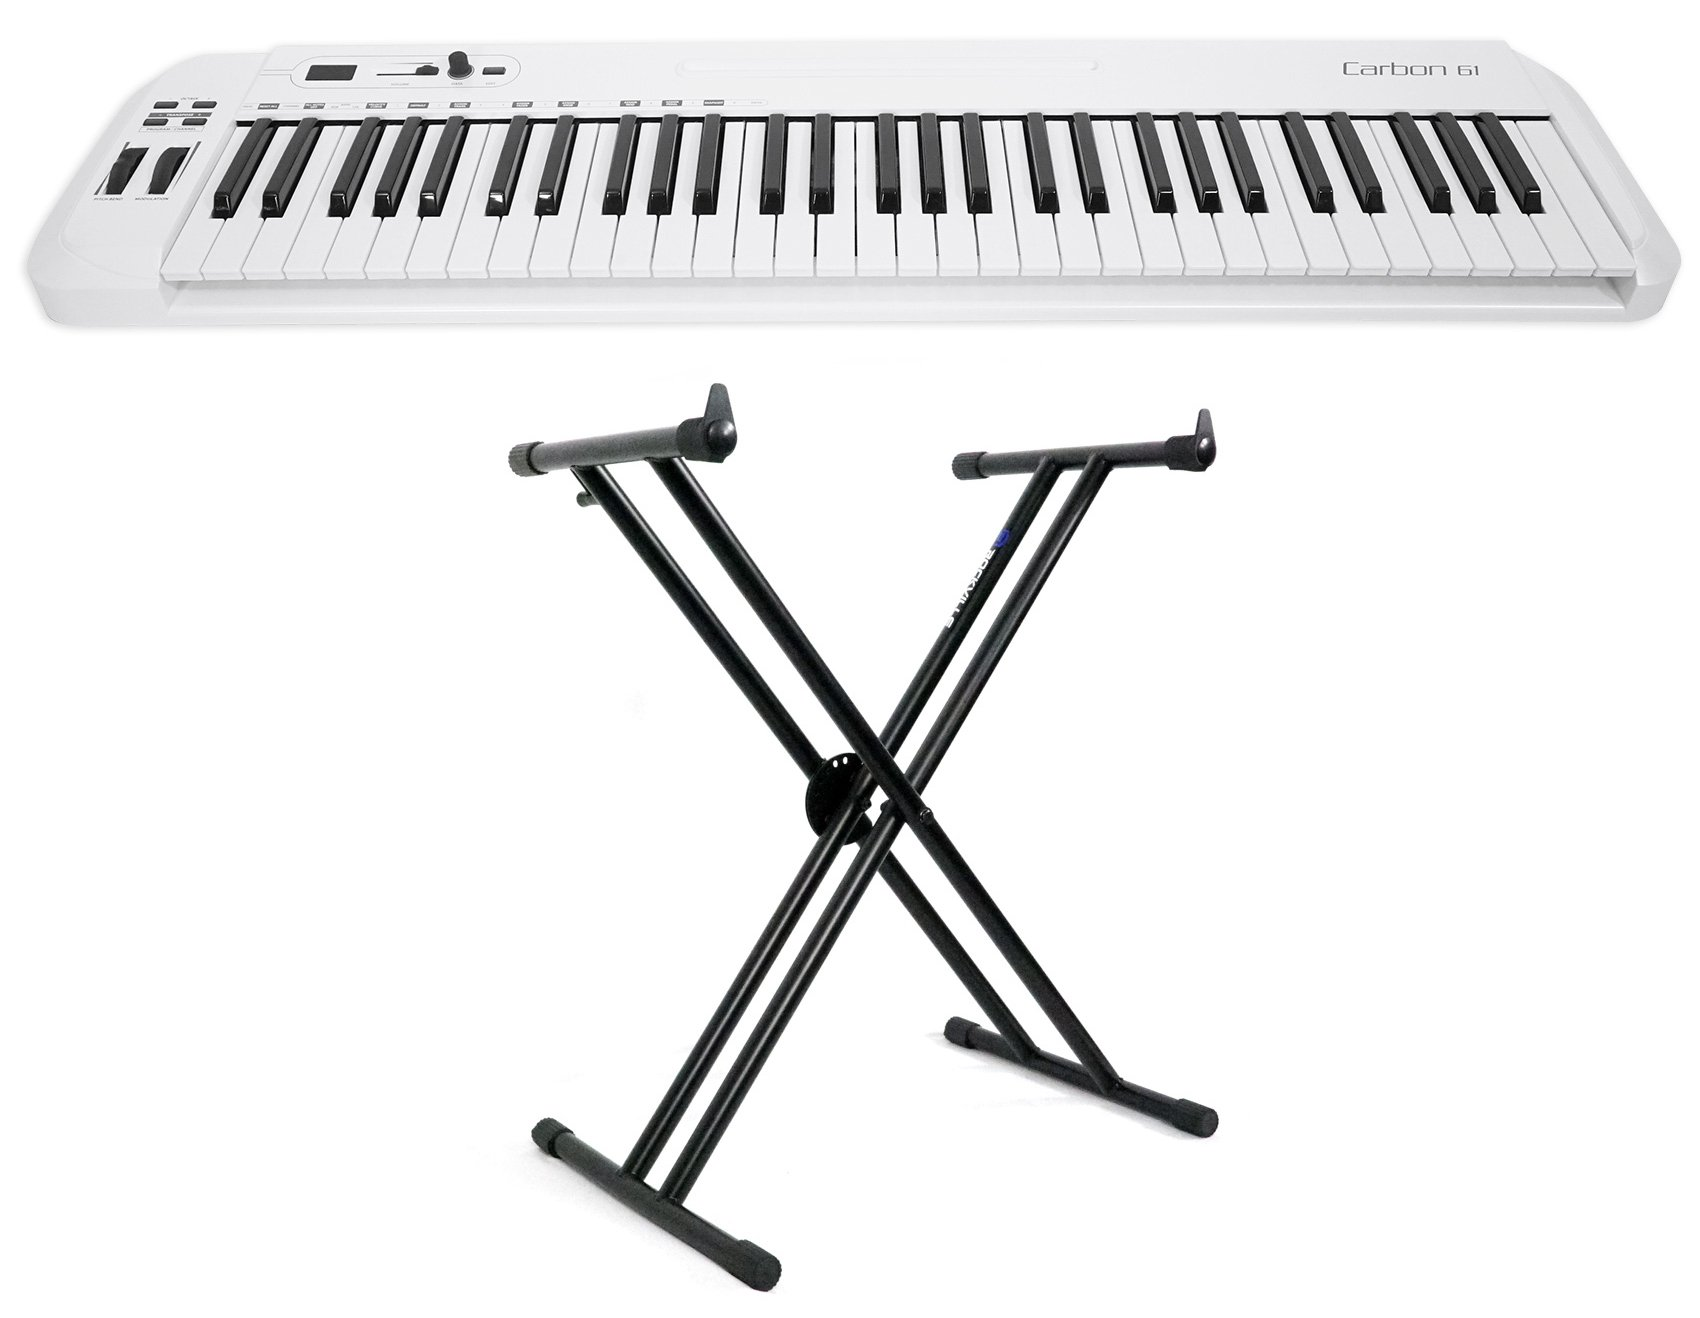 Samson Carbon 61 Key USB MIDI DJ Keyboard Controller + Software + Stand by Samson Technologies